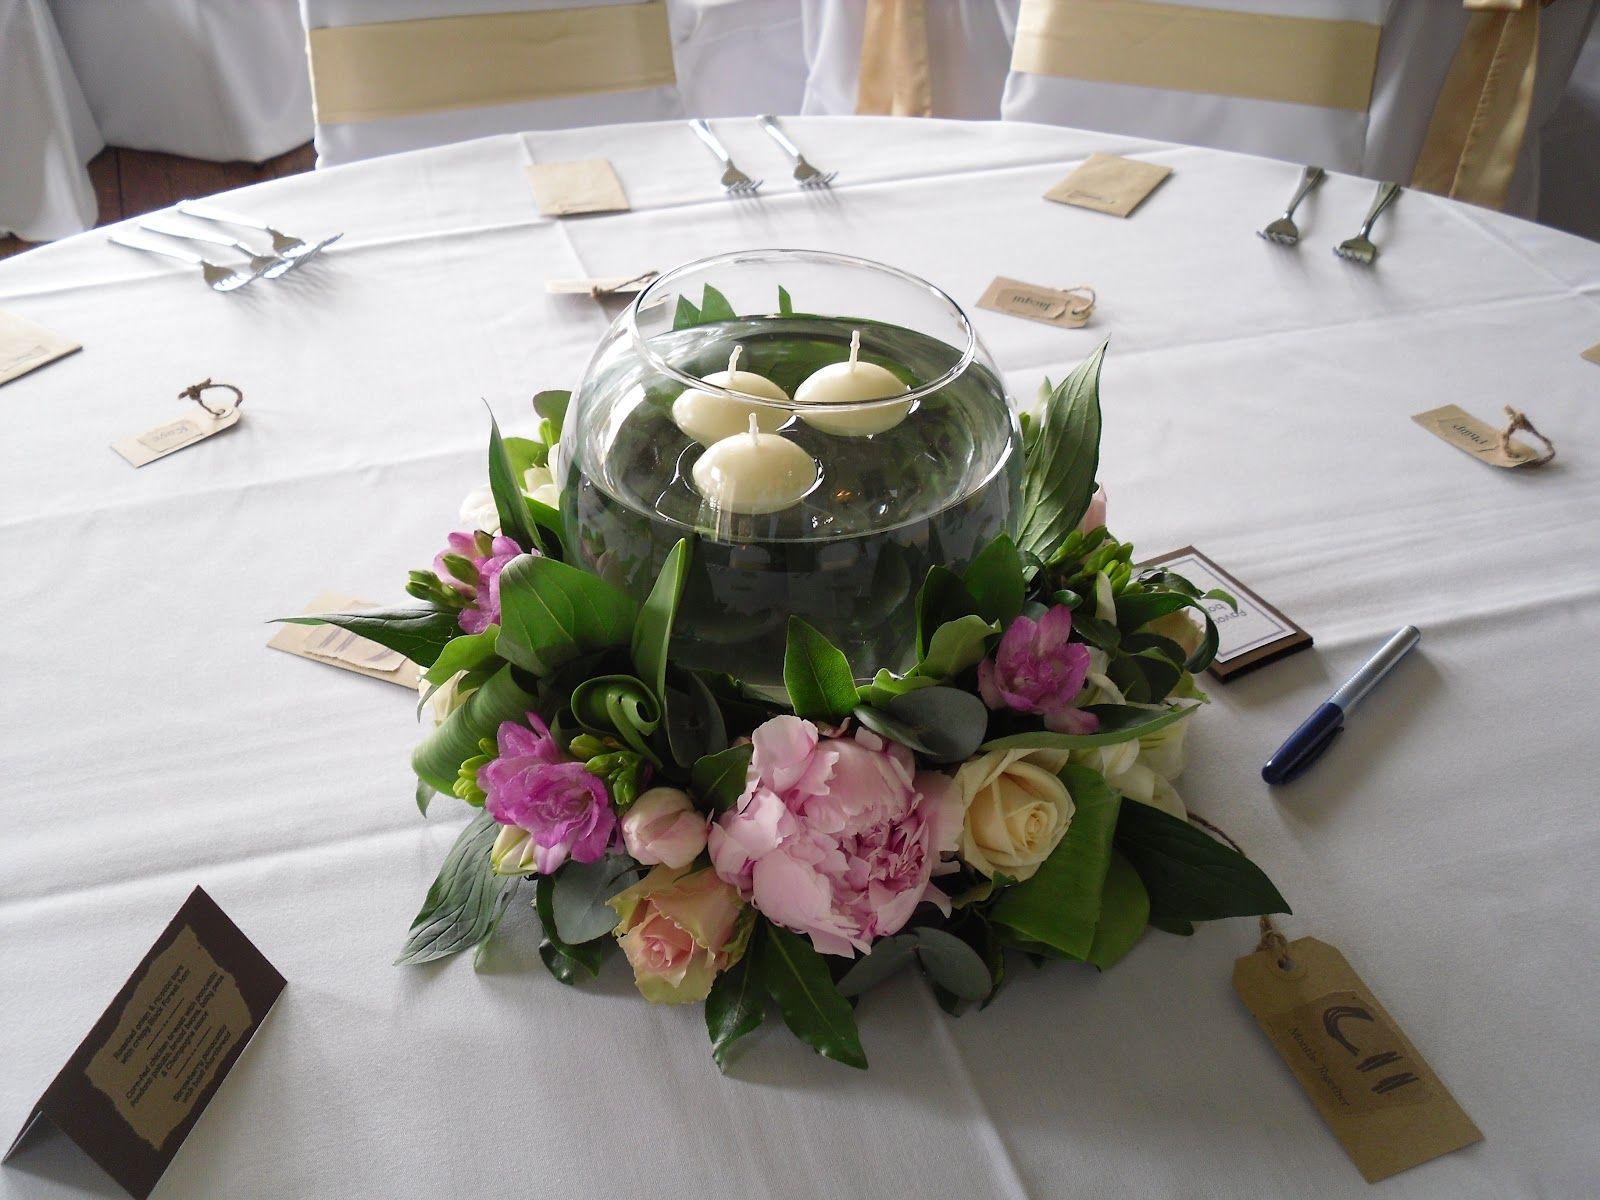 The table centres were a round arrangement of pink Sarah Bernhard